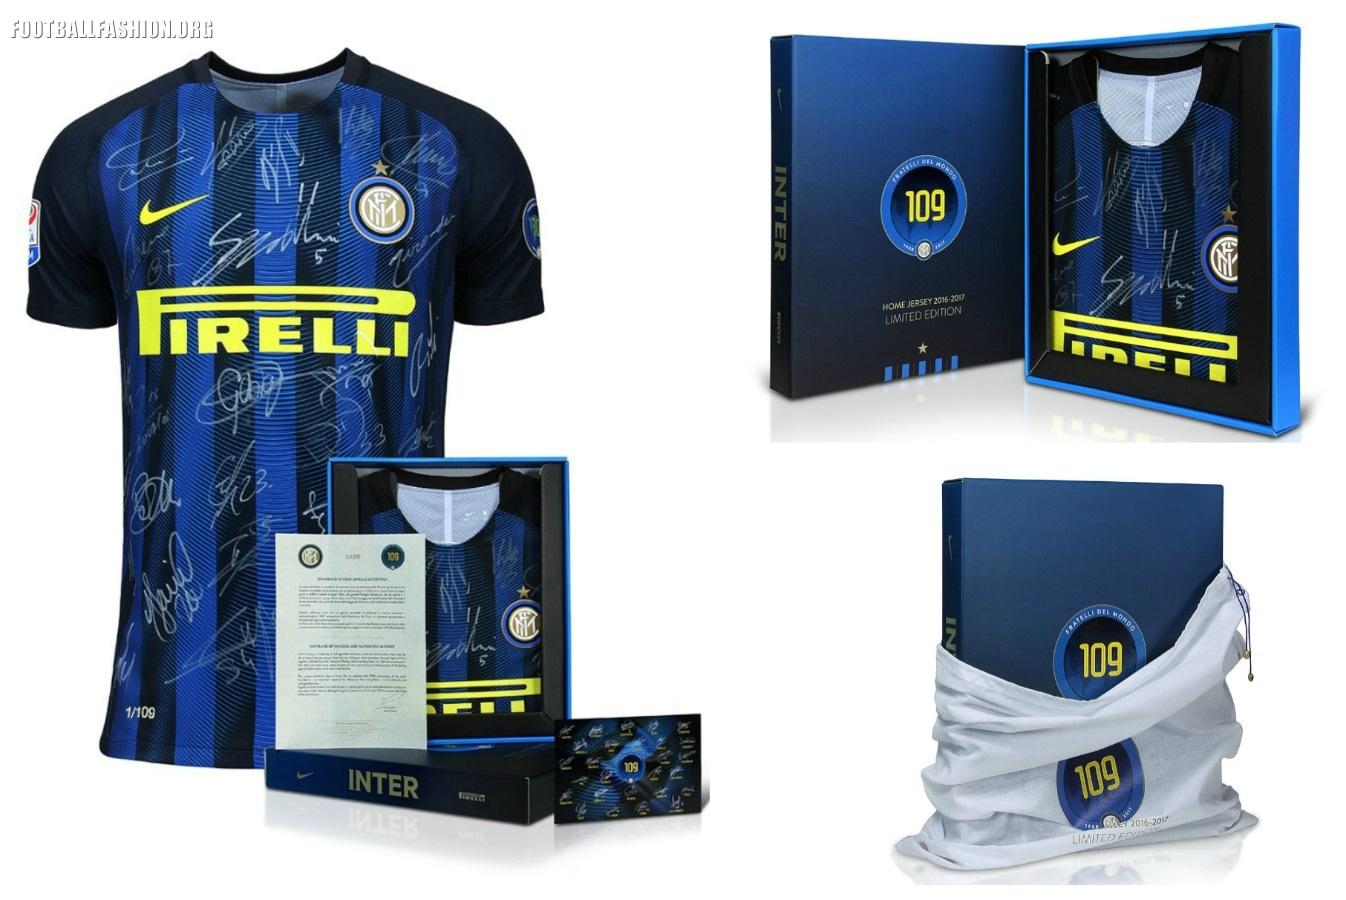 on sale 92bf6 fc3c8 Inter Milan 109th Anniversary Nike Jersey - FOOTBALL FASHION.ORG